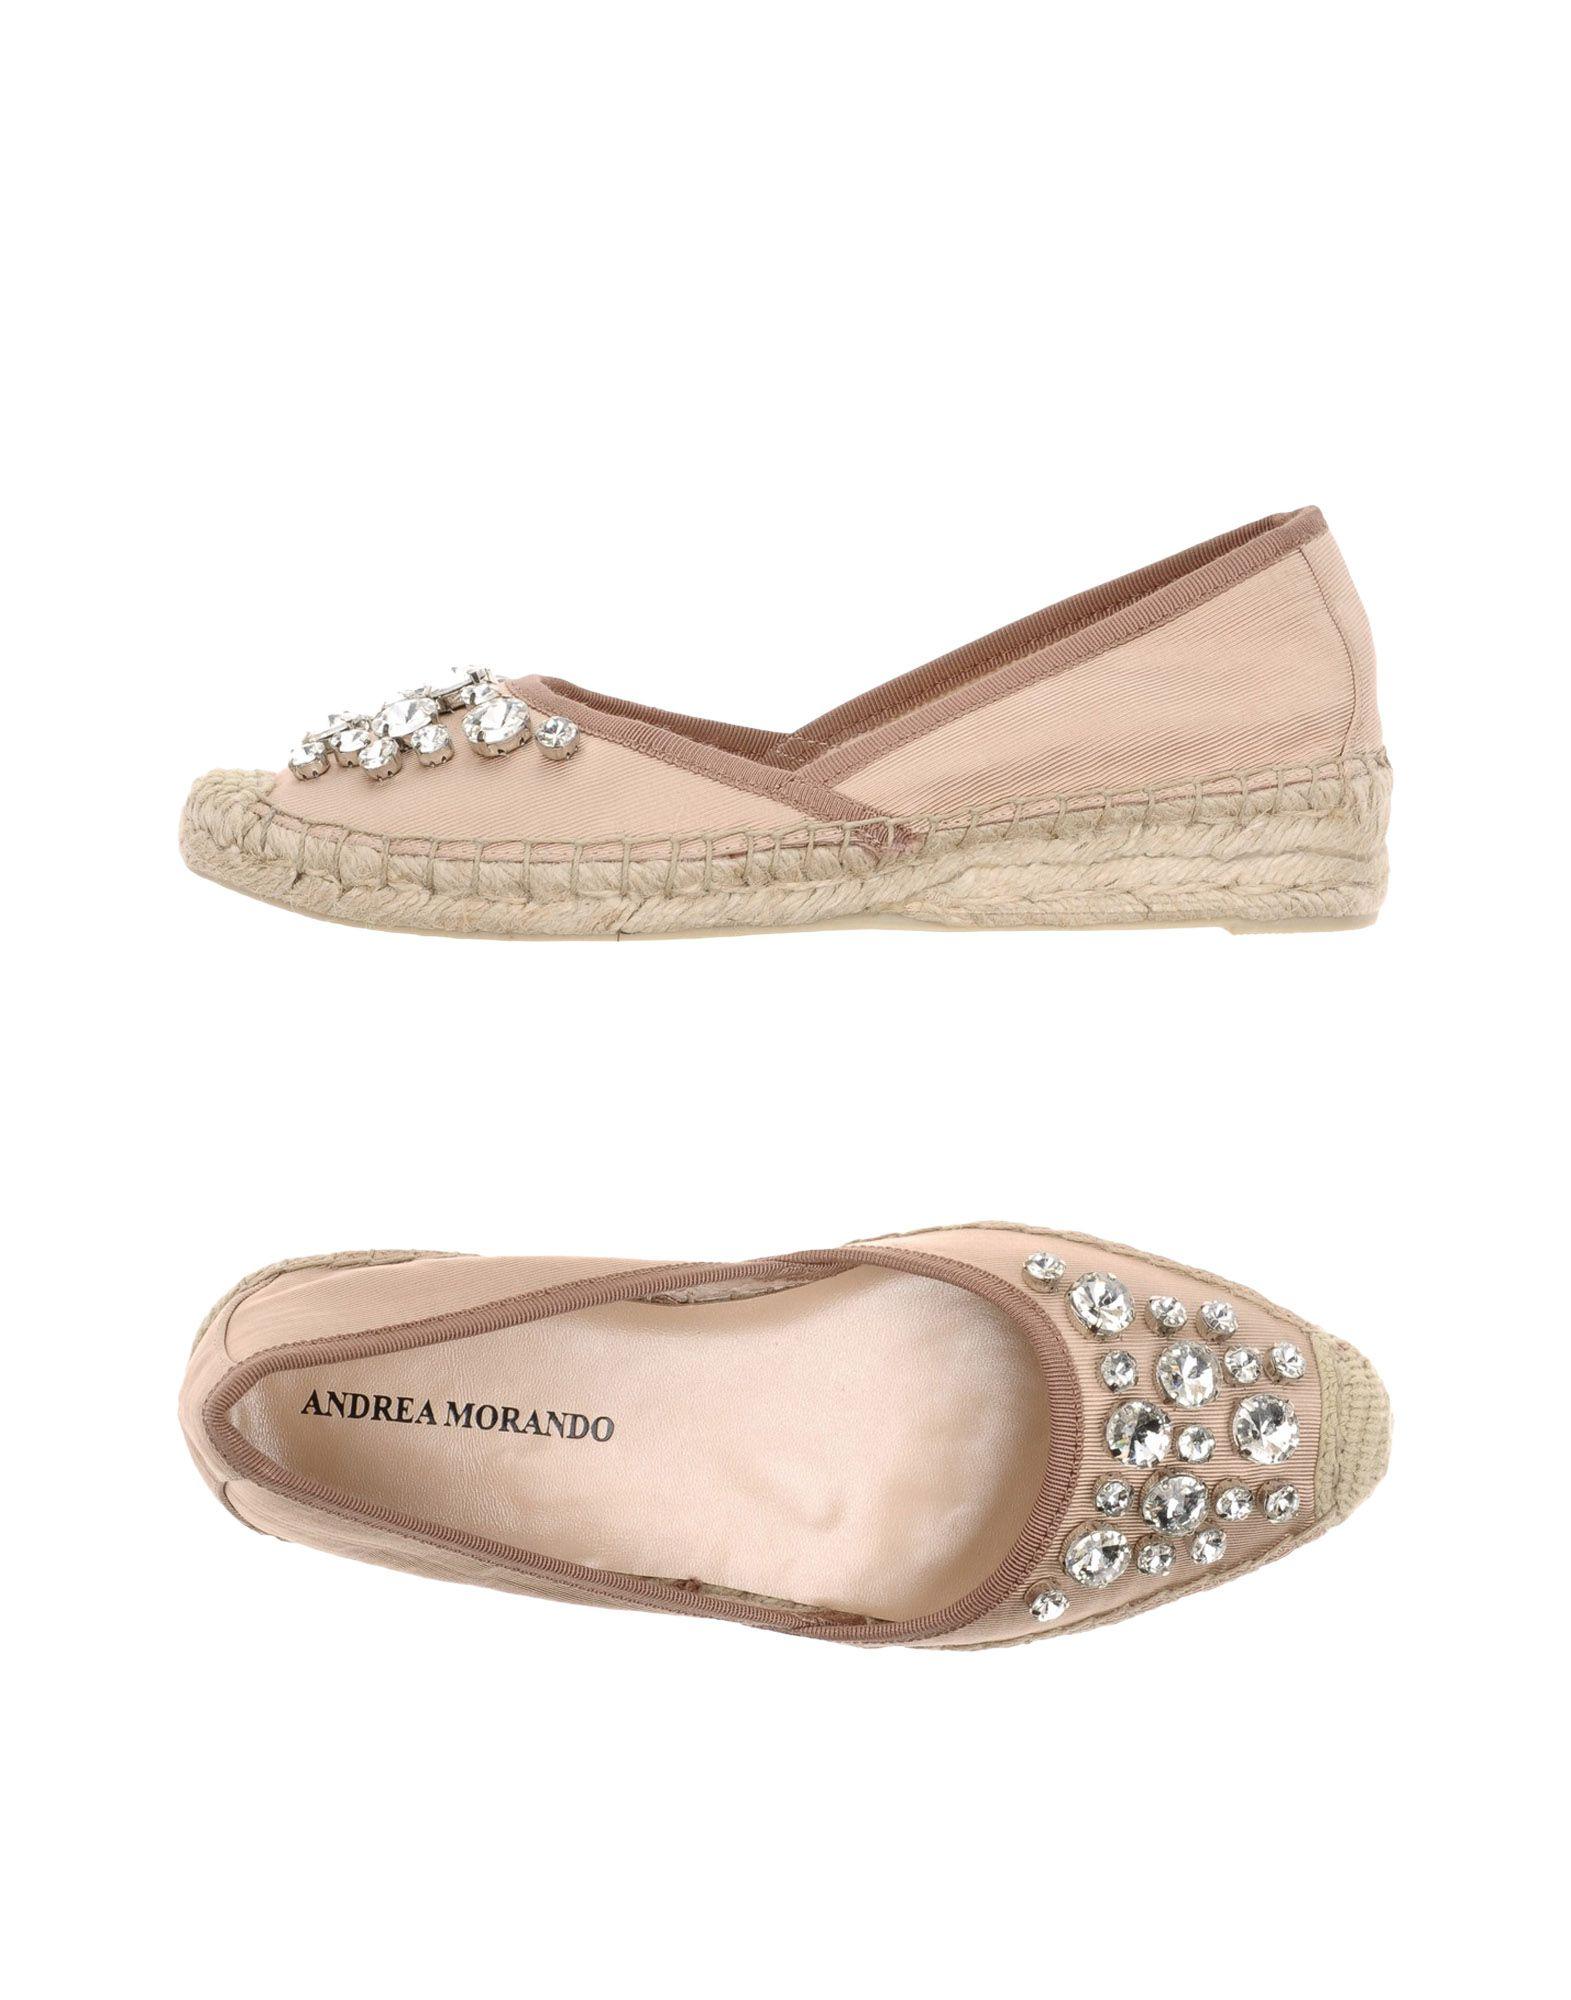 Andrea Morando Morando Andrea Espadrilles Damen  11363766AH Gute Qualität beliebte Schuhe af97d0